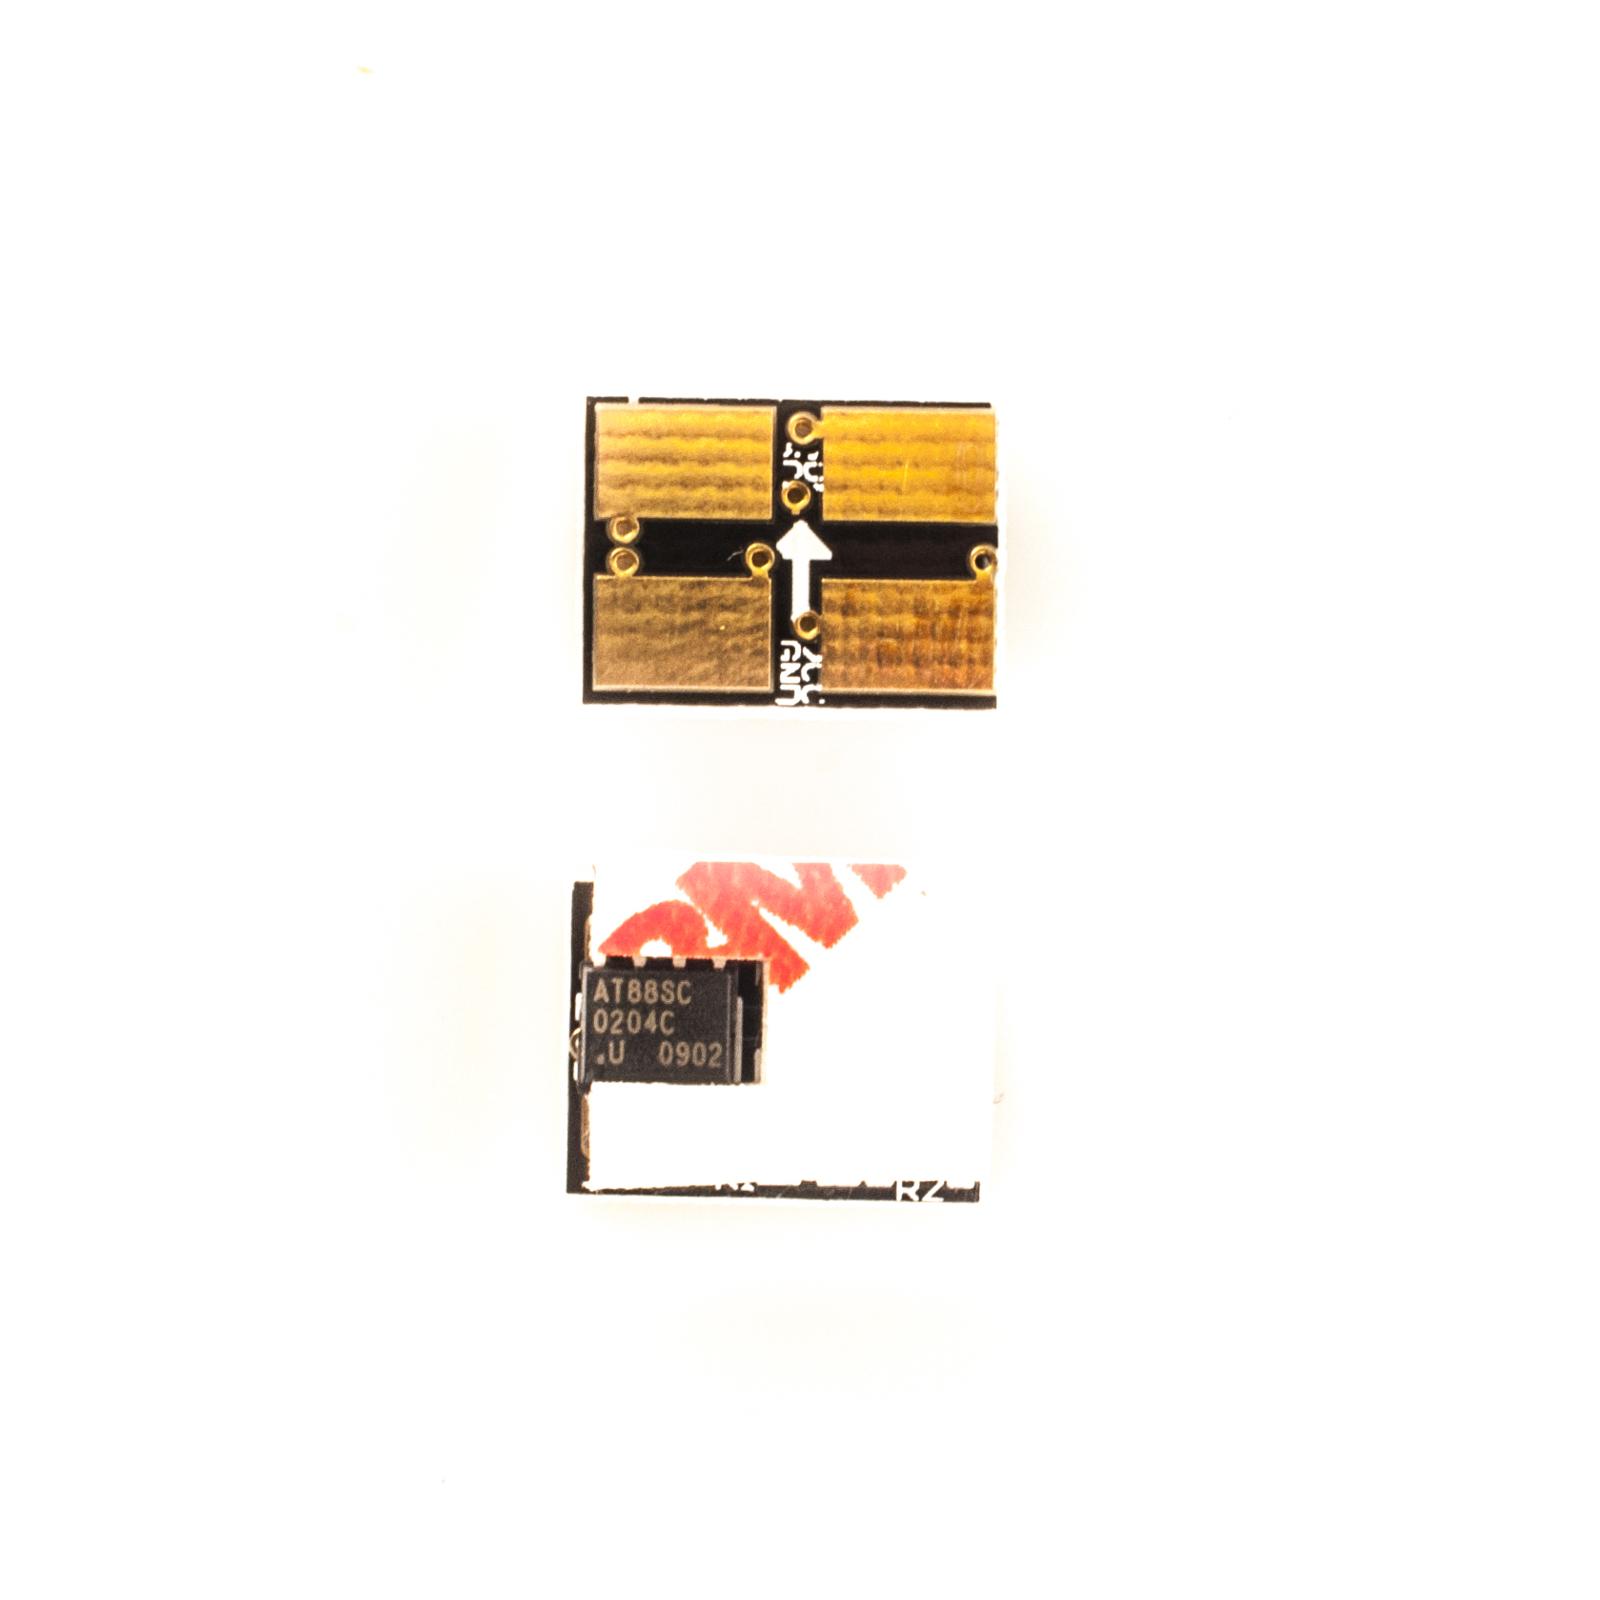 Чип для картриджа SAMSUNG CLP-350 BLACK Apex (CLS-K350)